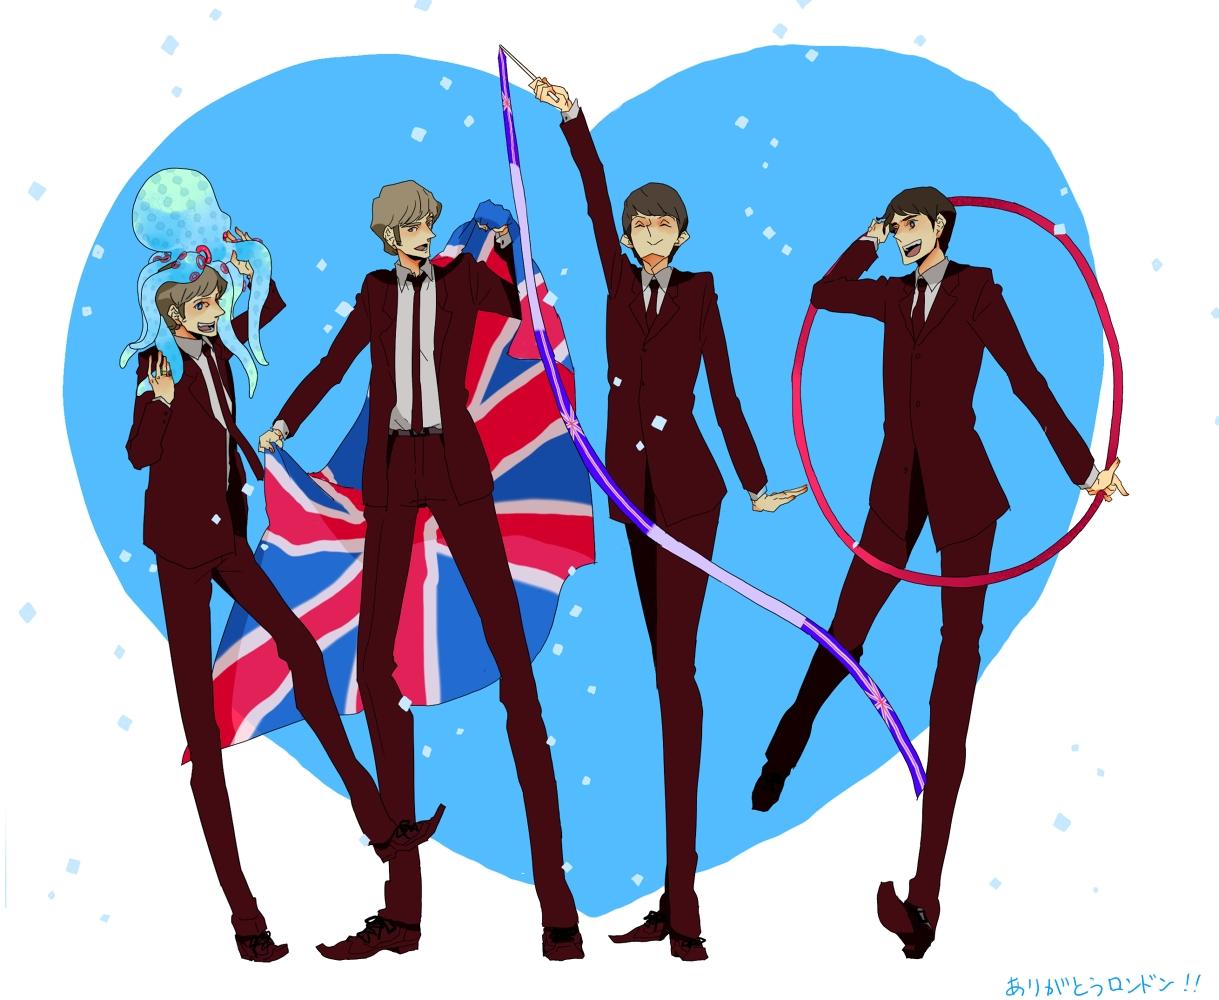 Tags Anime Ringo Starr John Lennon George Harrison Paul Mccartney